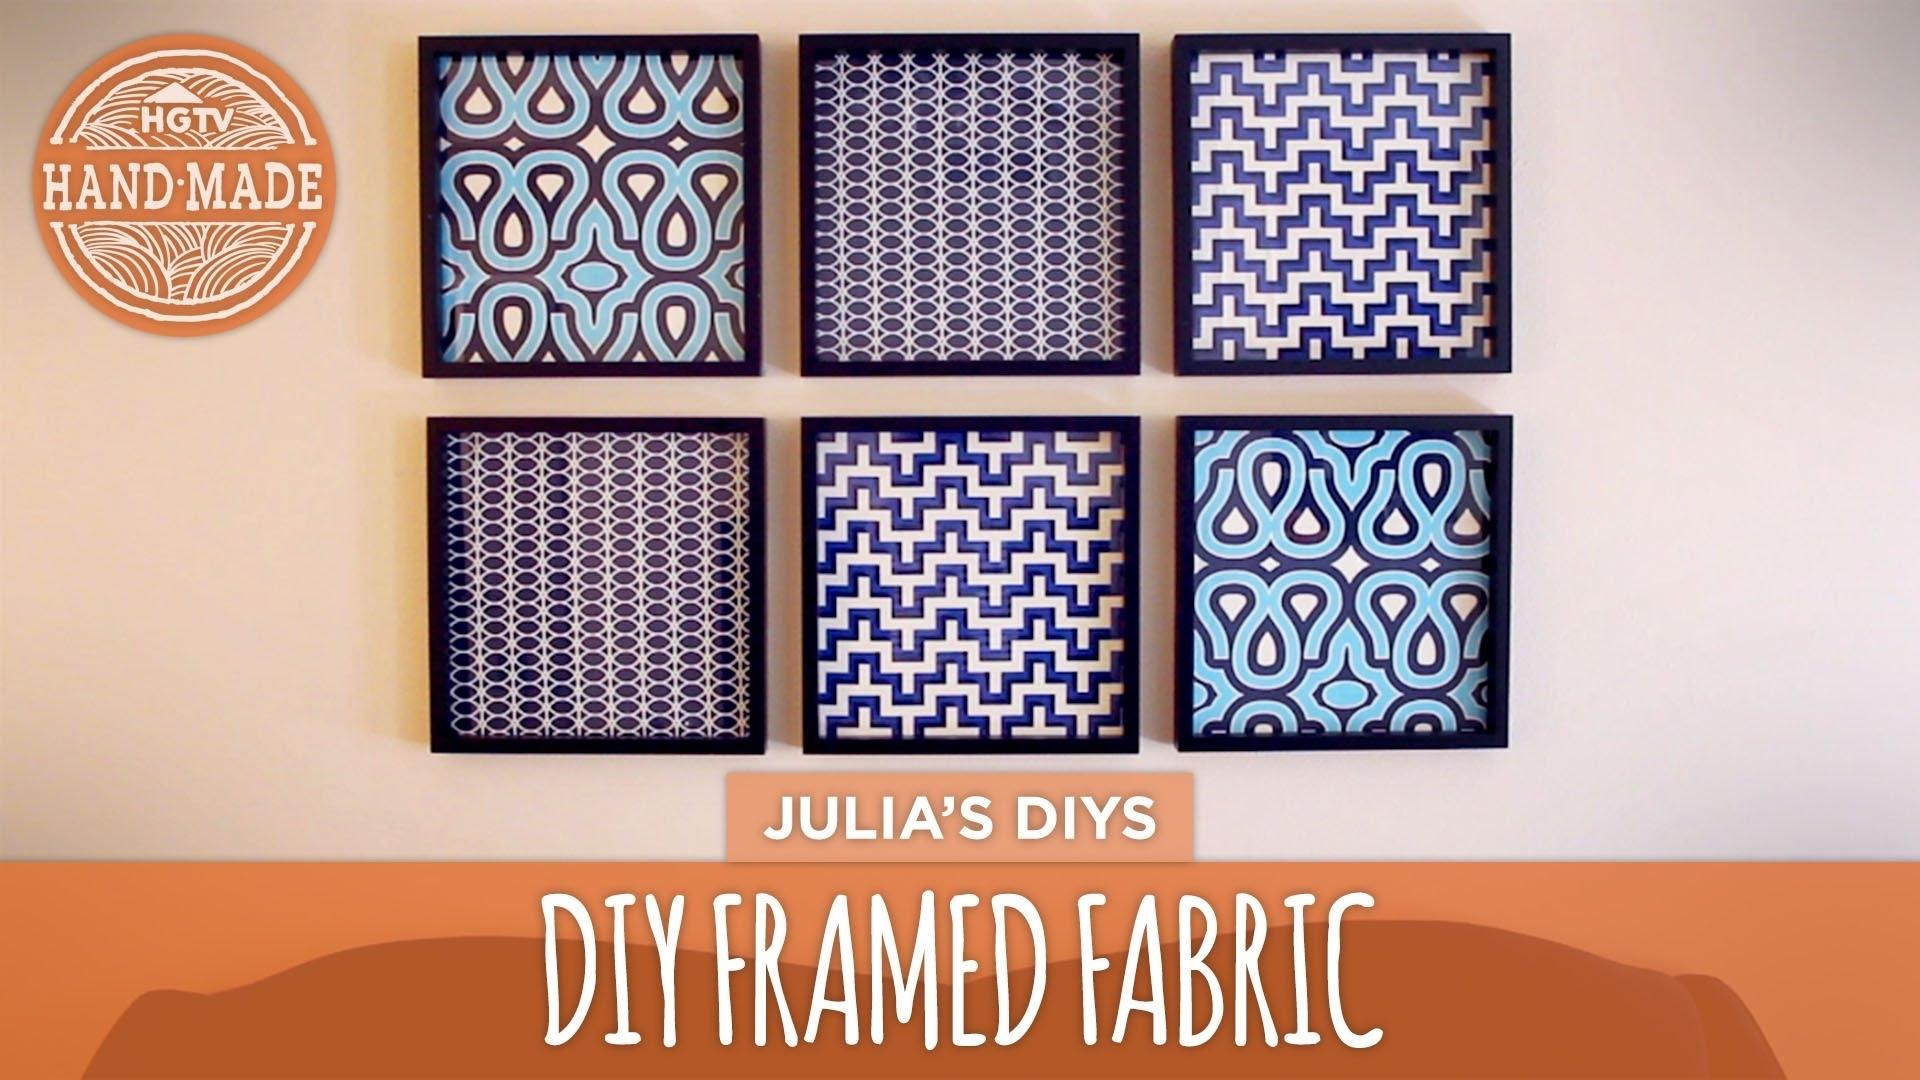 Diy Framed Fabric Gallery Wall - Hgtv Handmade - Youtube regarding Most Current Framed Textile Wall Art